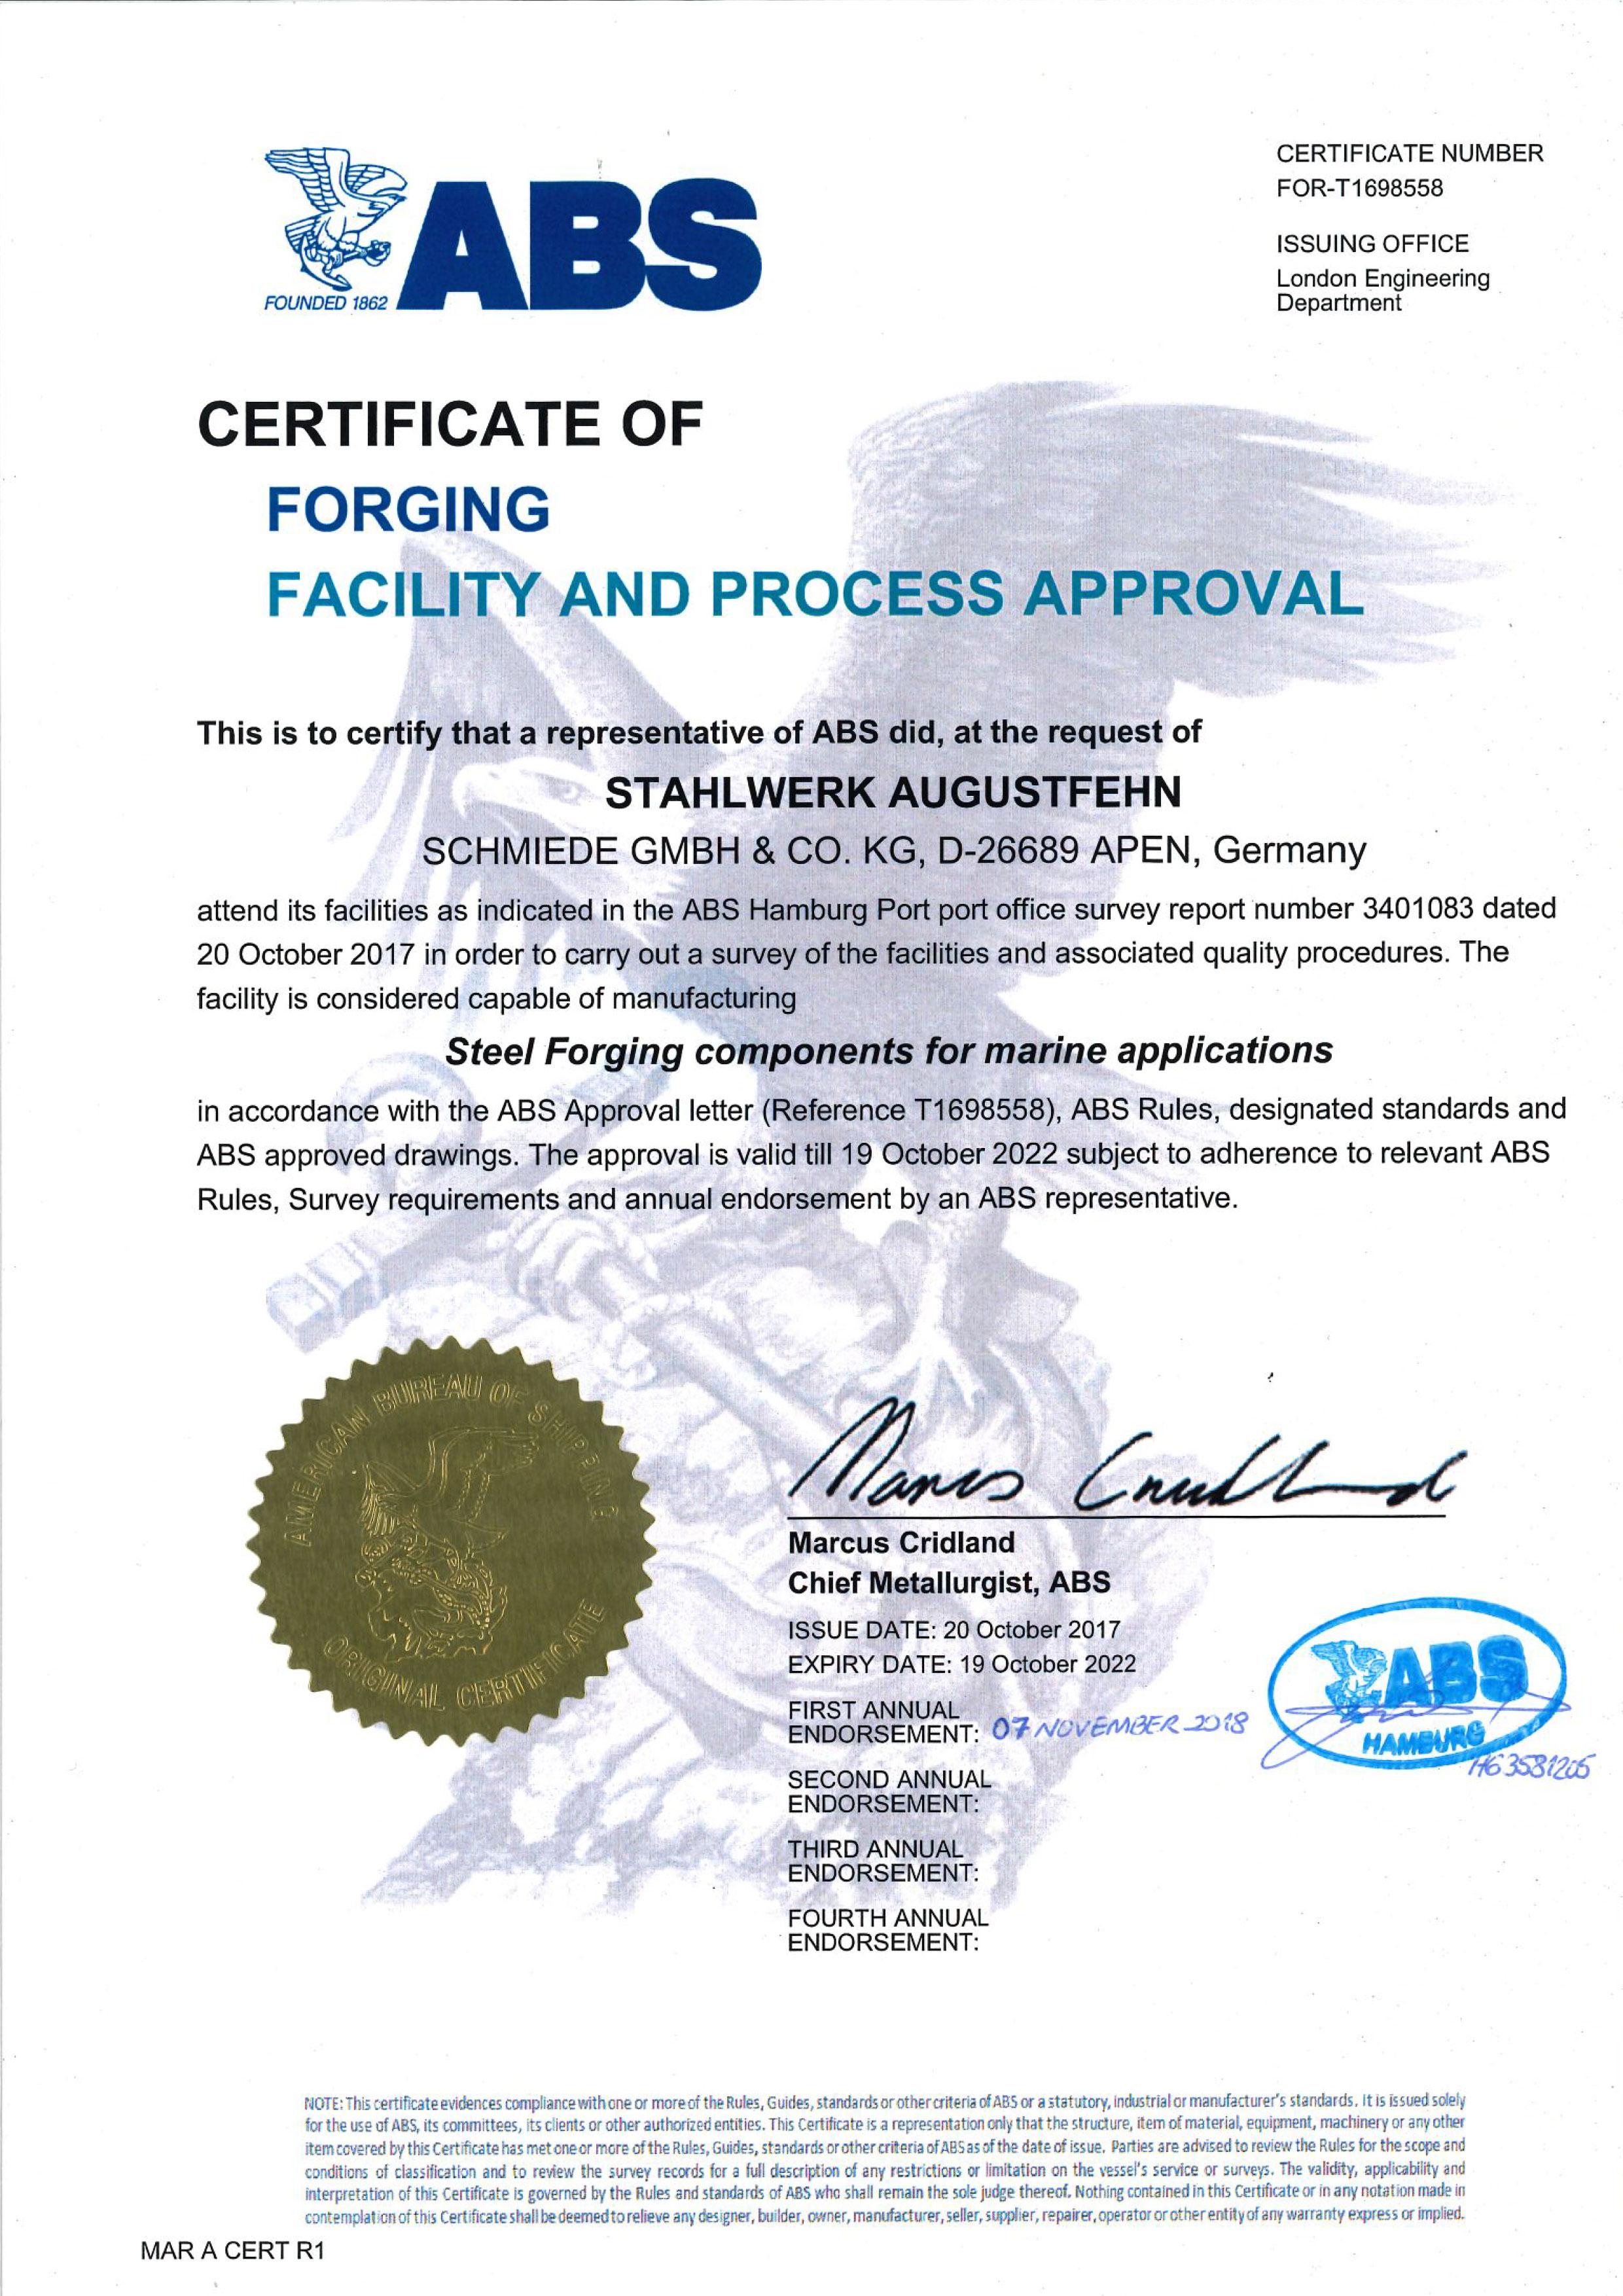 ABS-Zertifikat_T1698558_2018.11.07